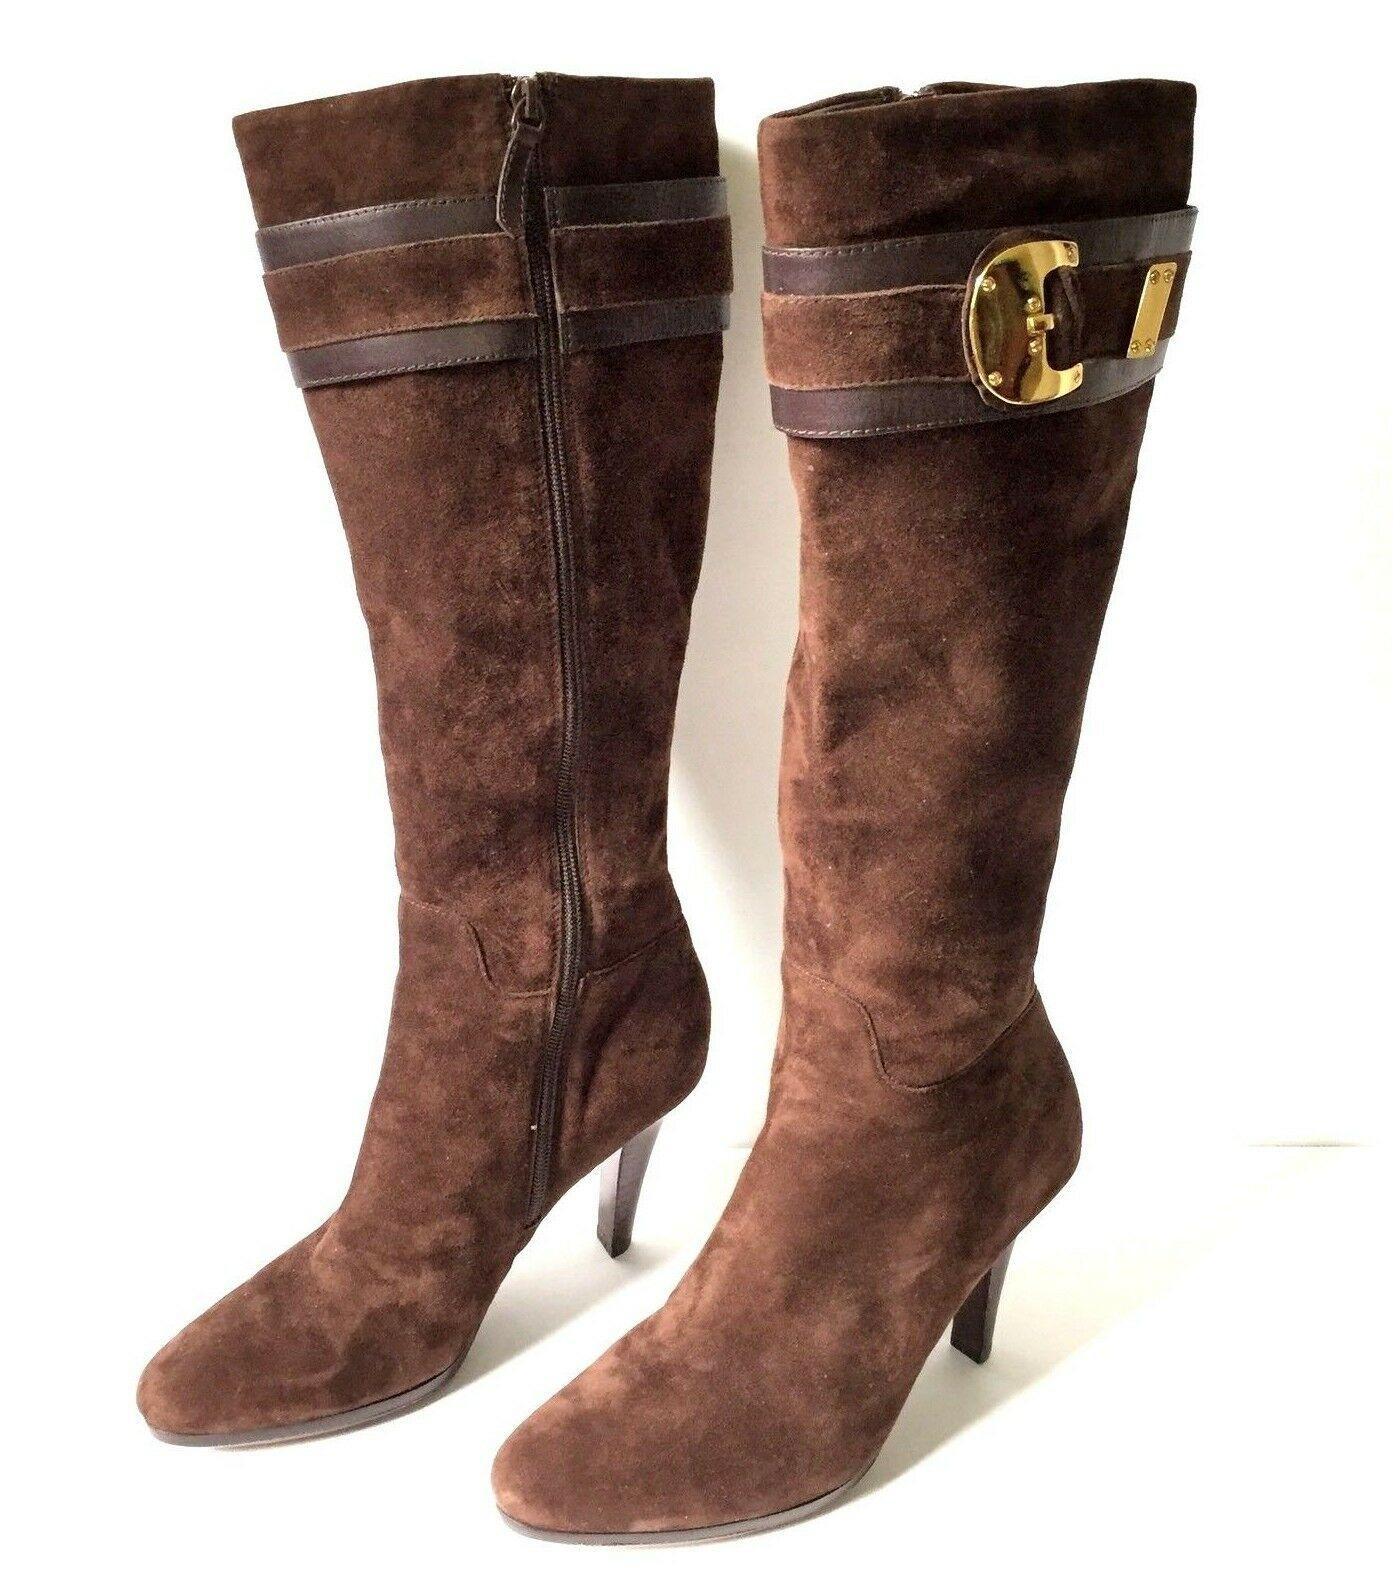 Cole Haan Leather Suede Zipper Boots - Women's Size 9 Medium - Dark Brown